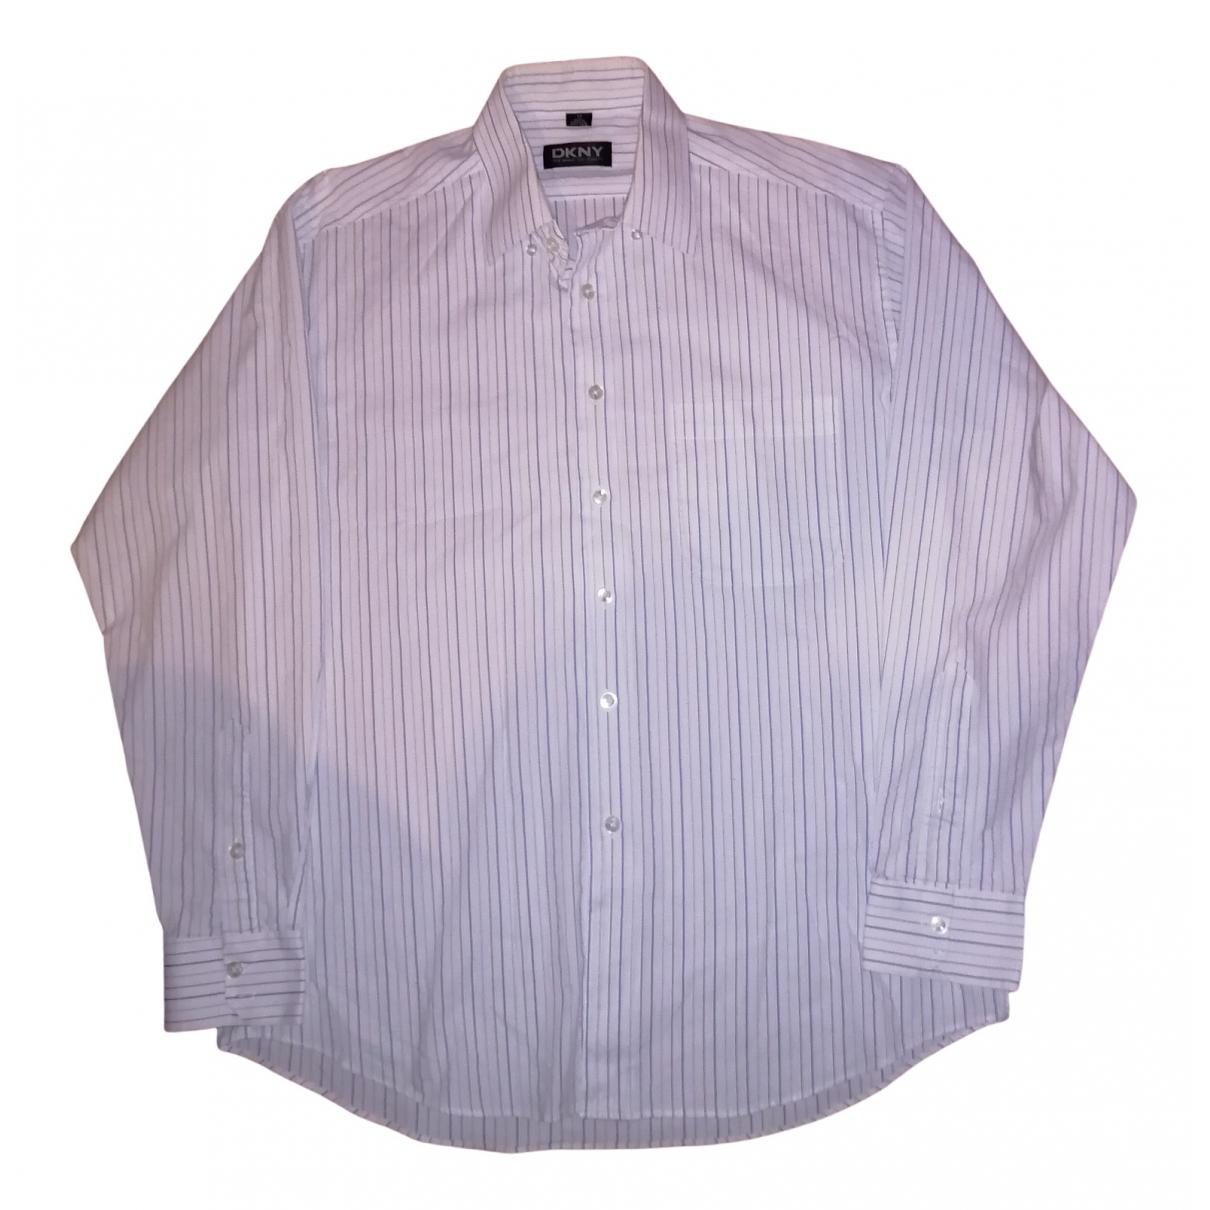 Dkny \N White Cotton Polo shirts for Men XL International